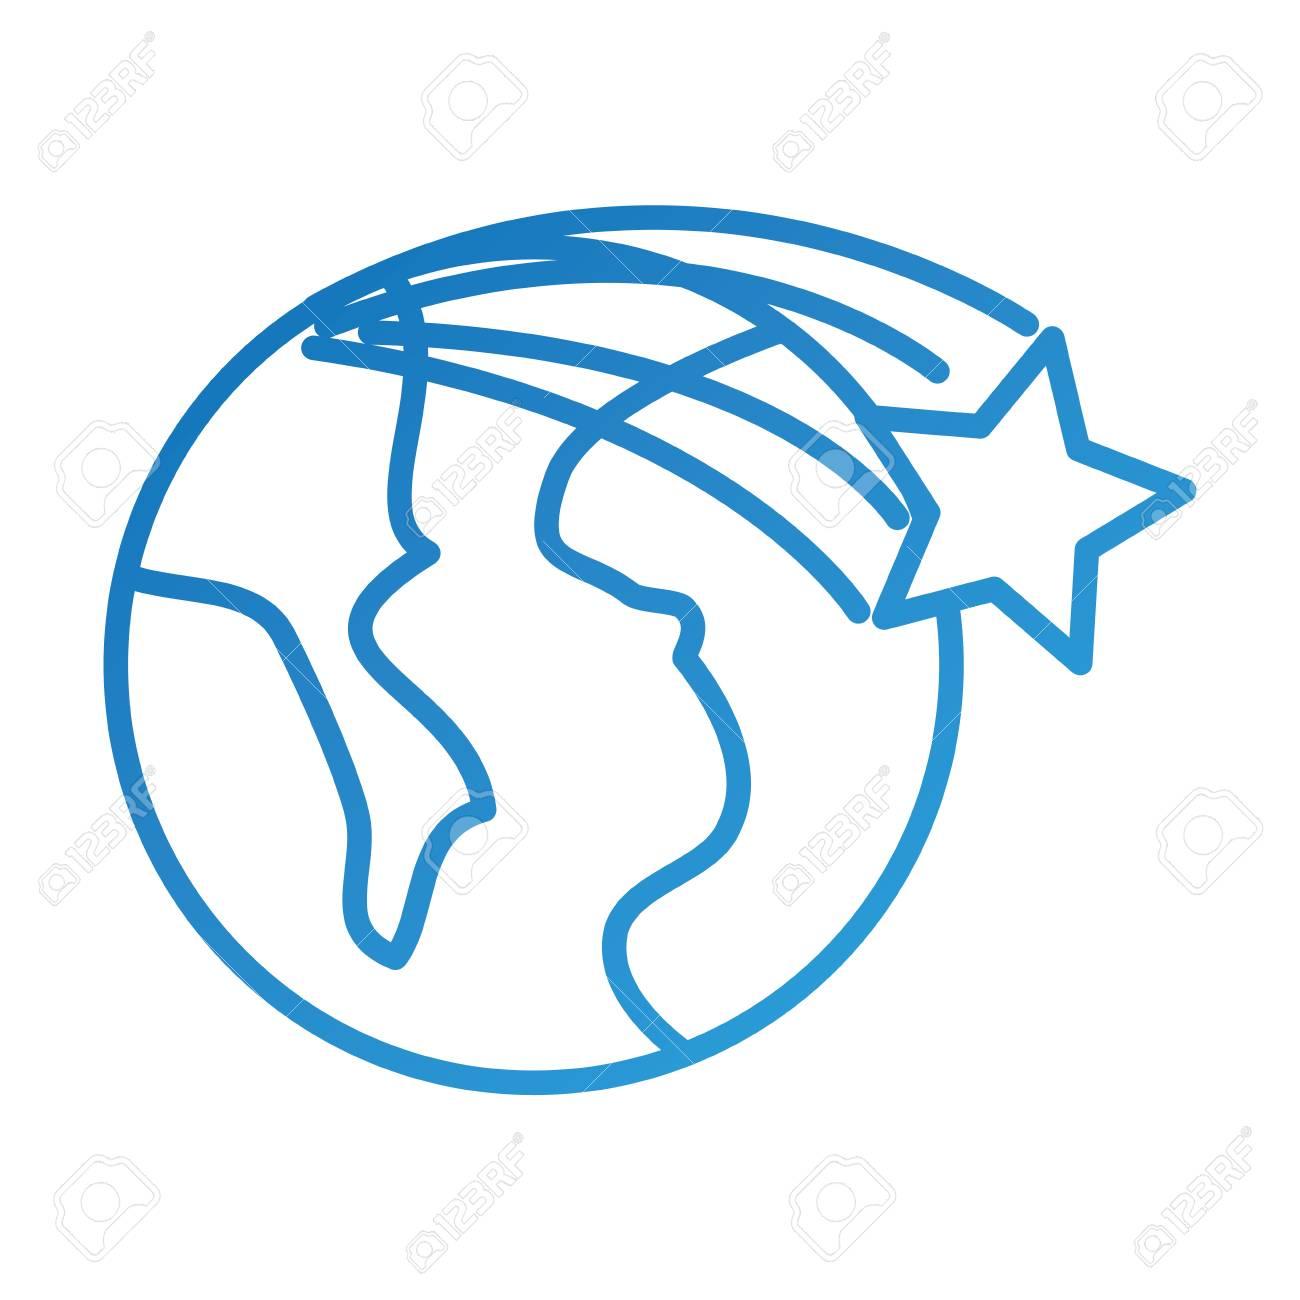 Univers Planete Terre Etoile Espace Dessin Anime Vector Illustration